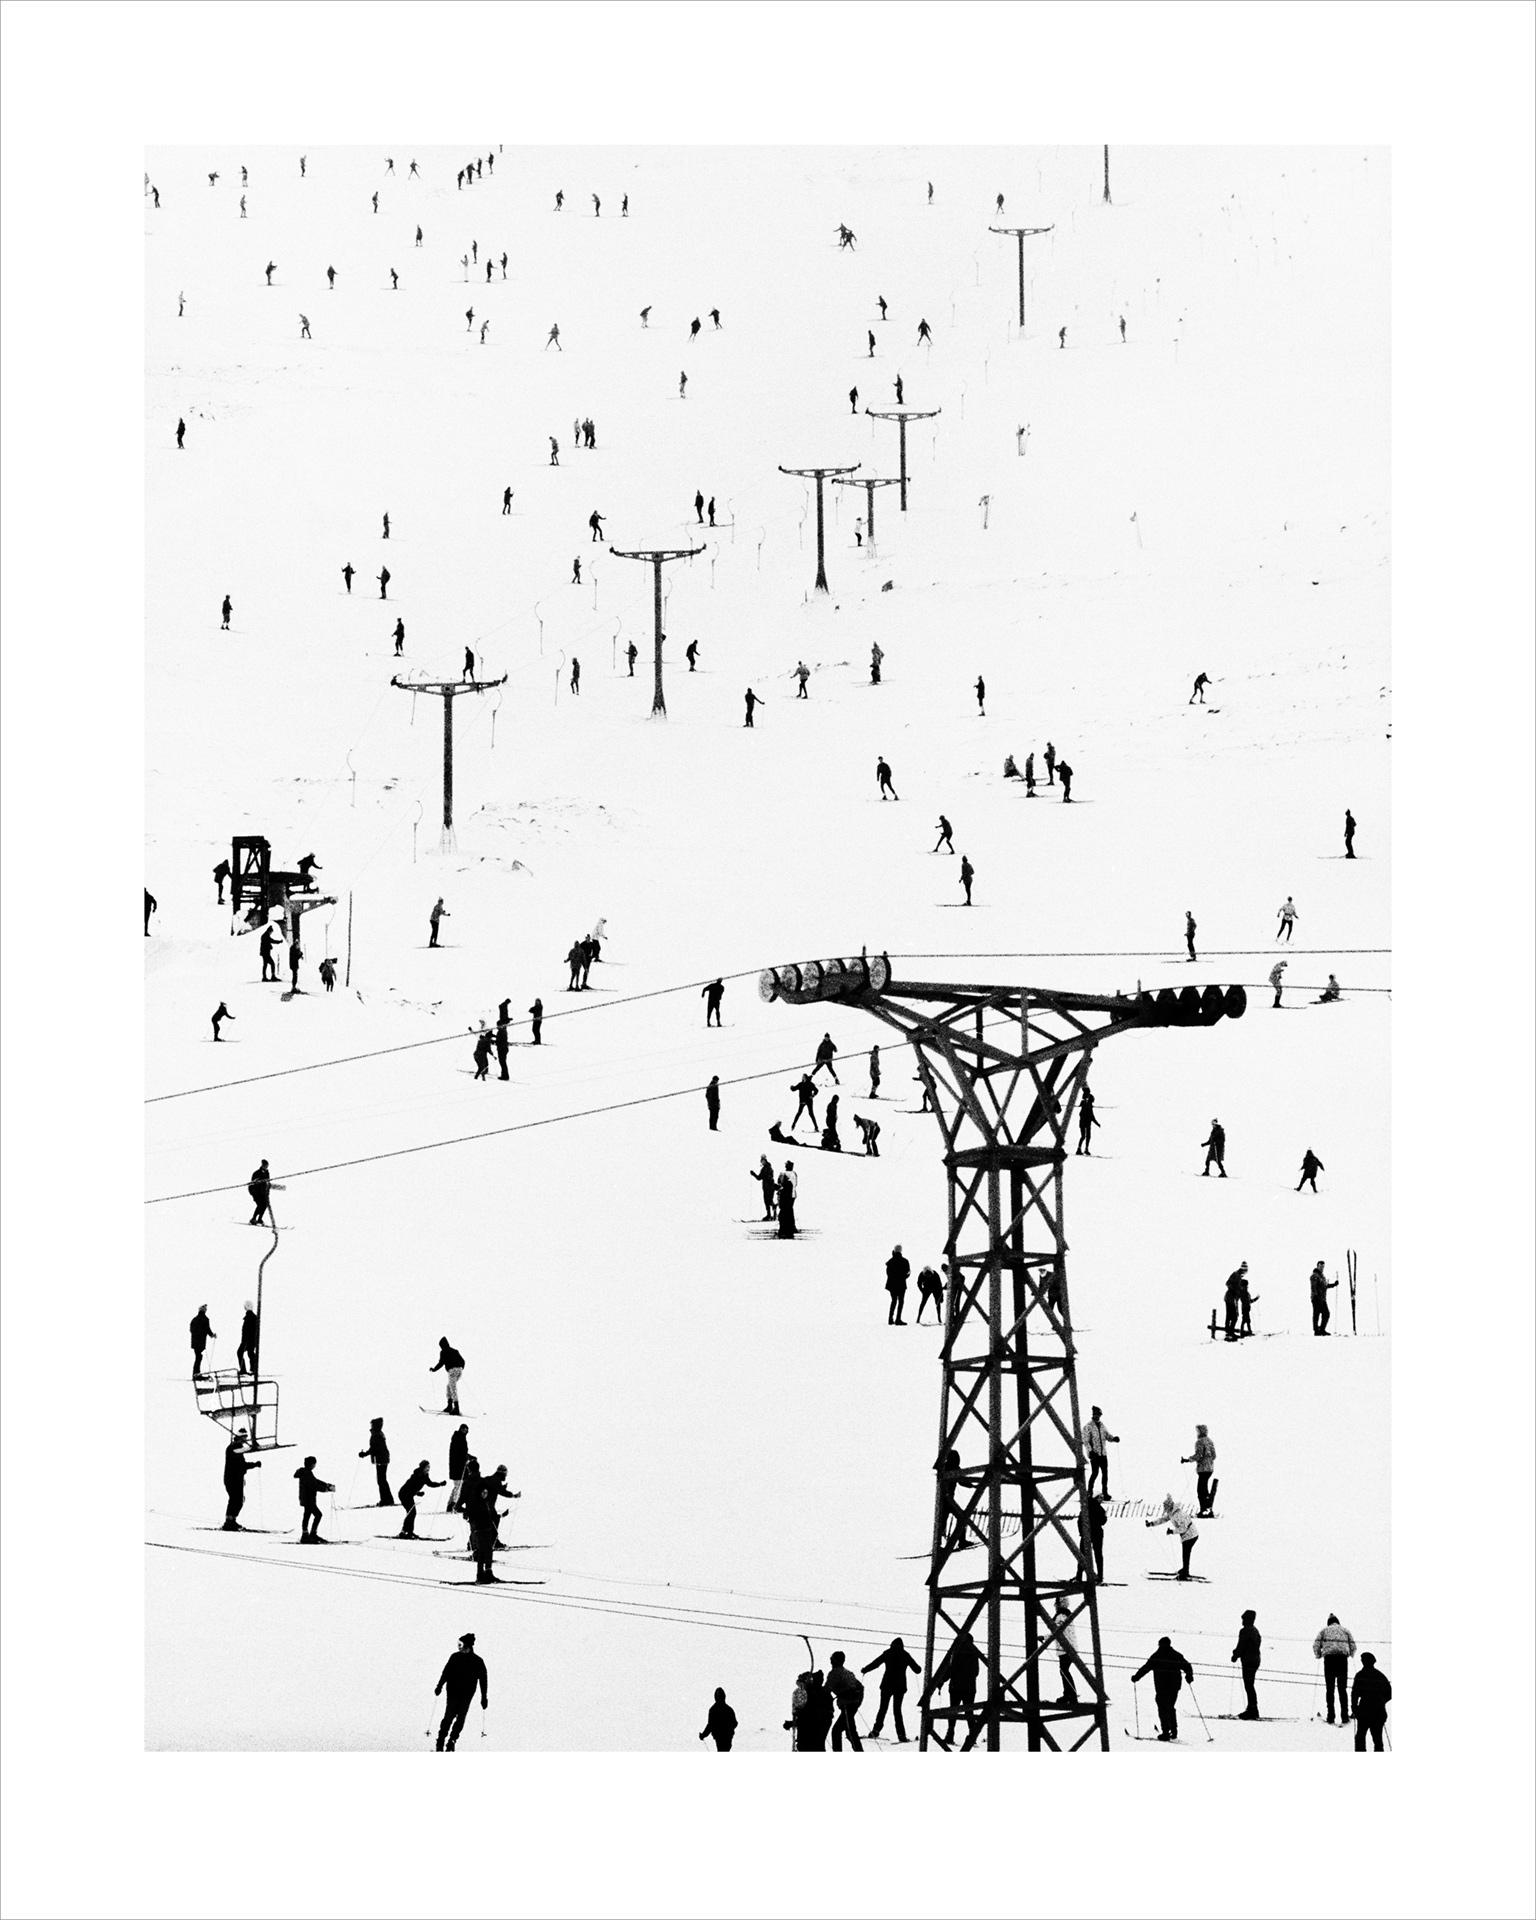 Image of Cairngorm Ski Slopes (1970) by Oscar Marzaroli